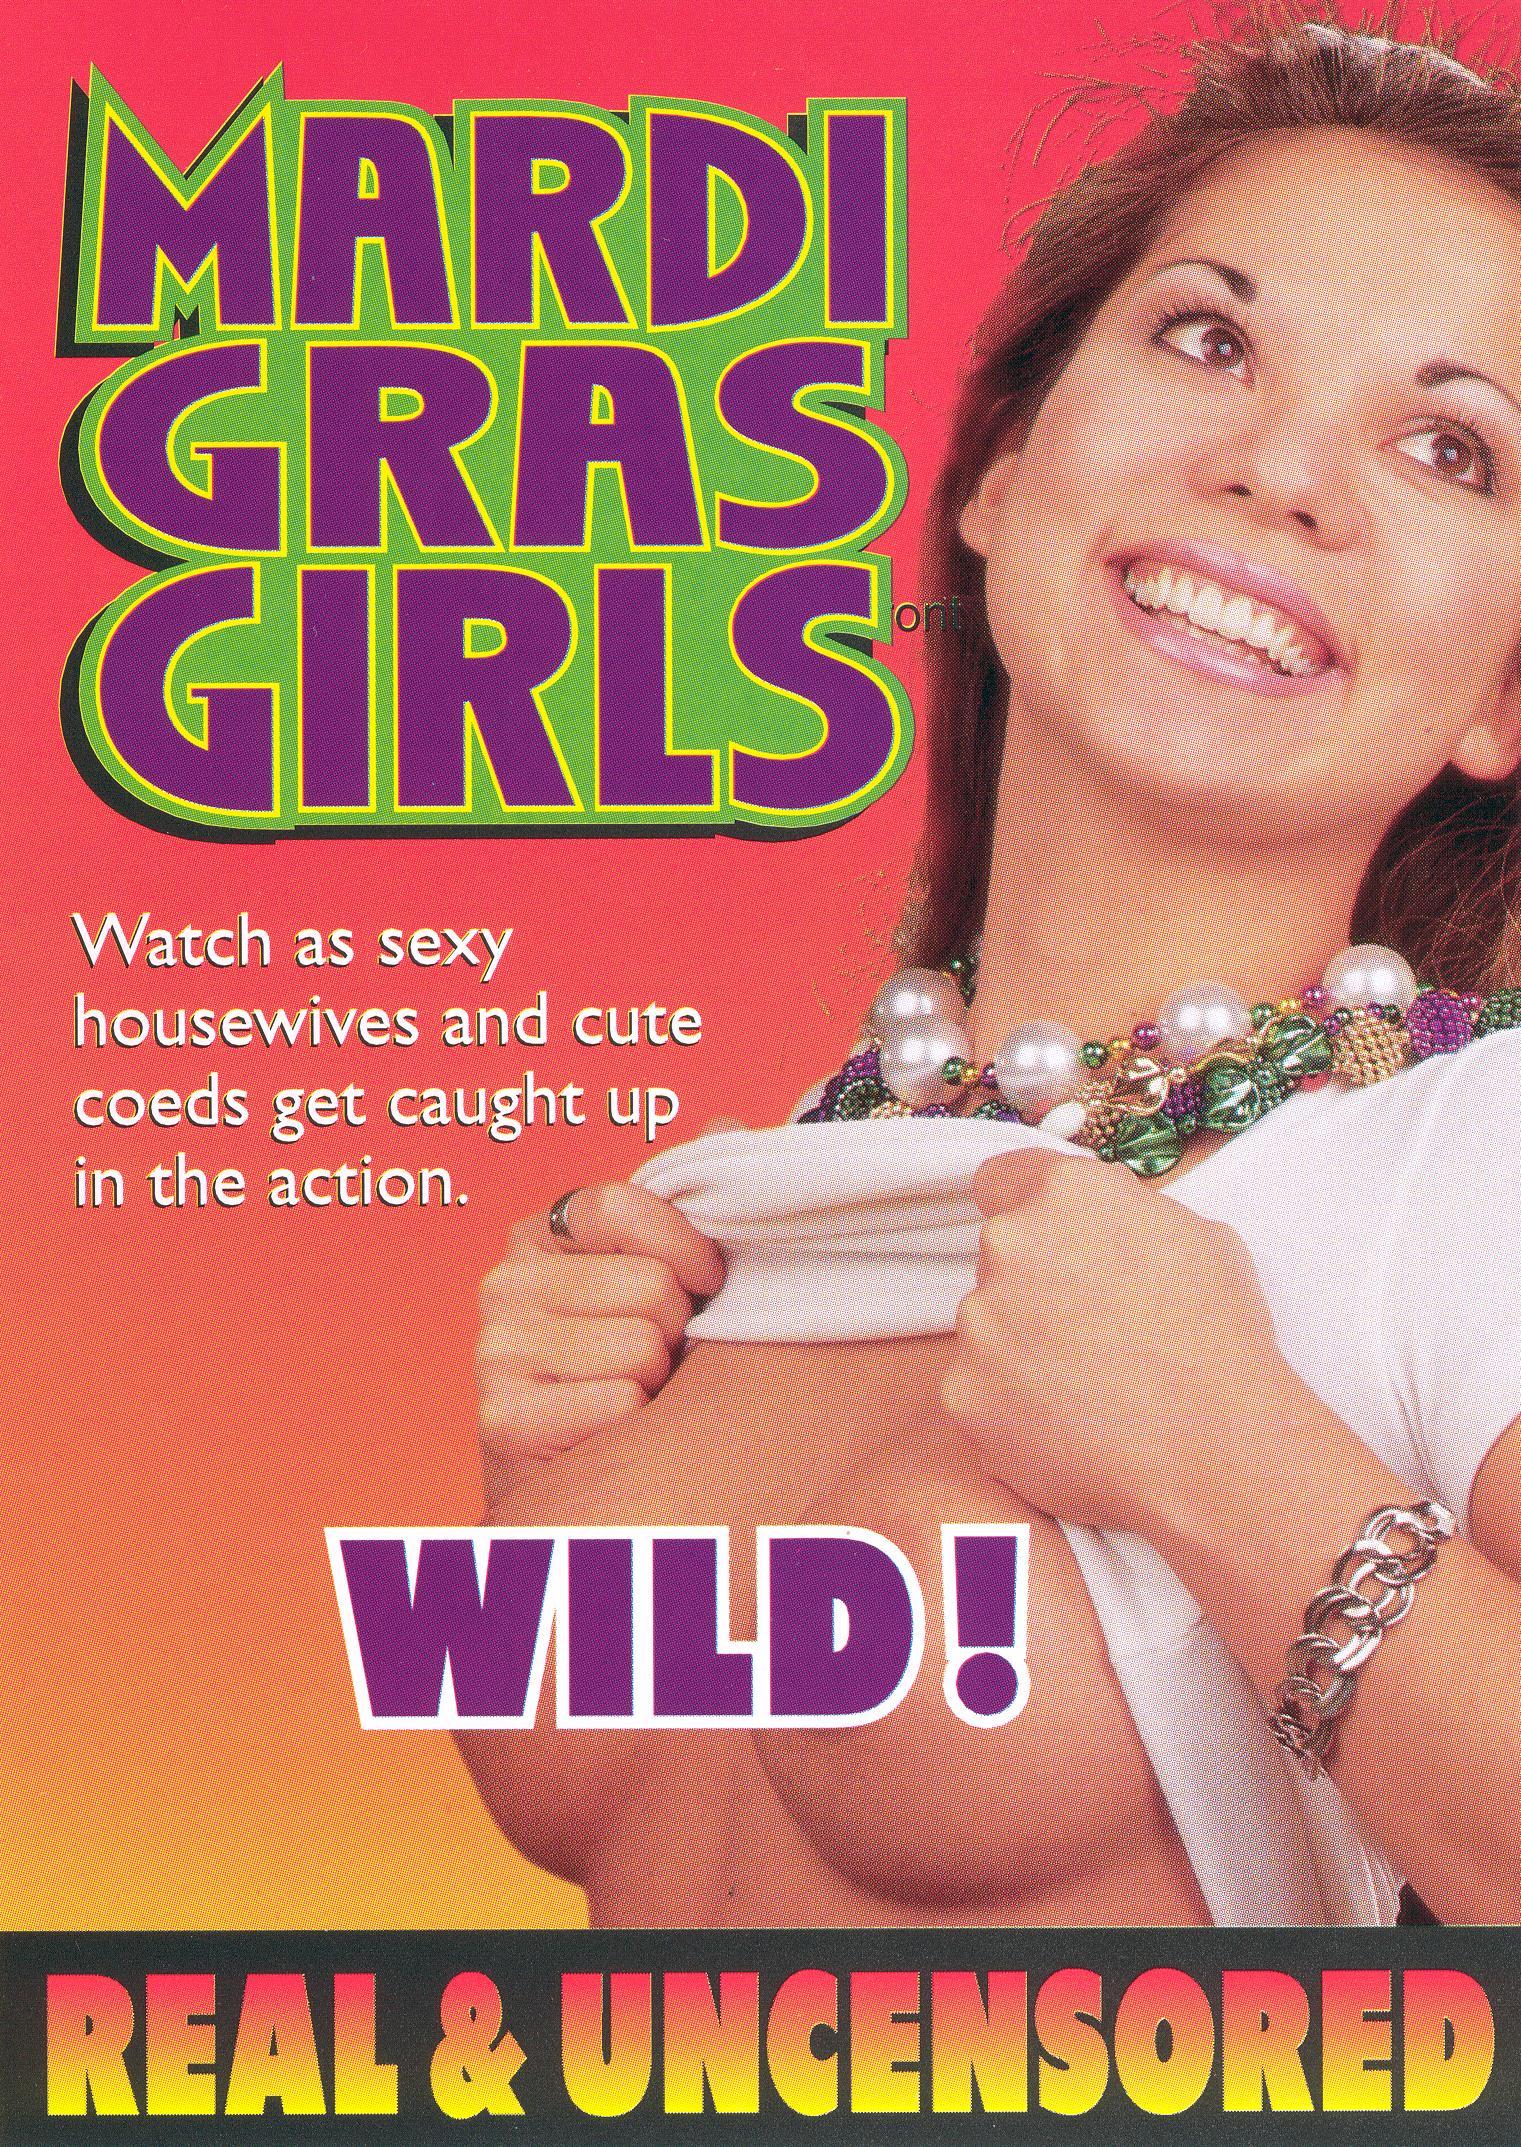 Mardi Gras Girls: Wild! Real & Uncensored